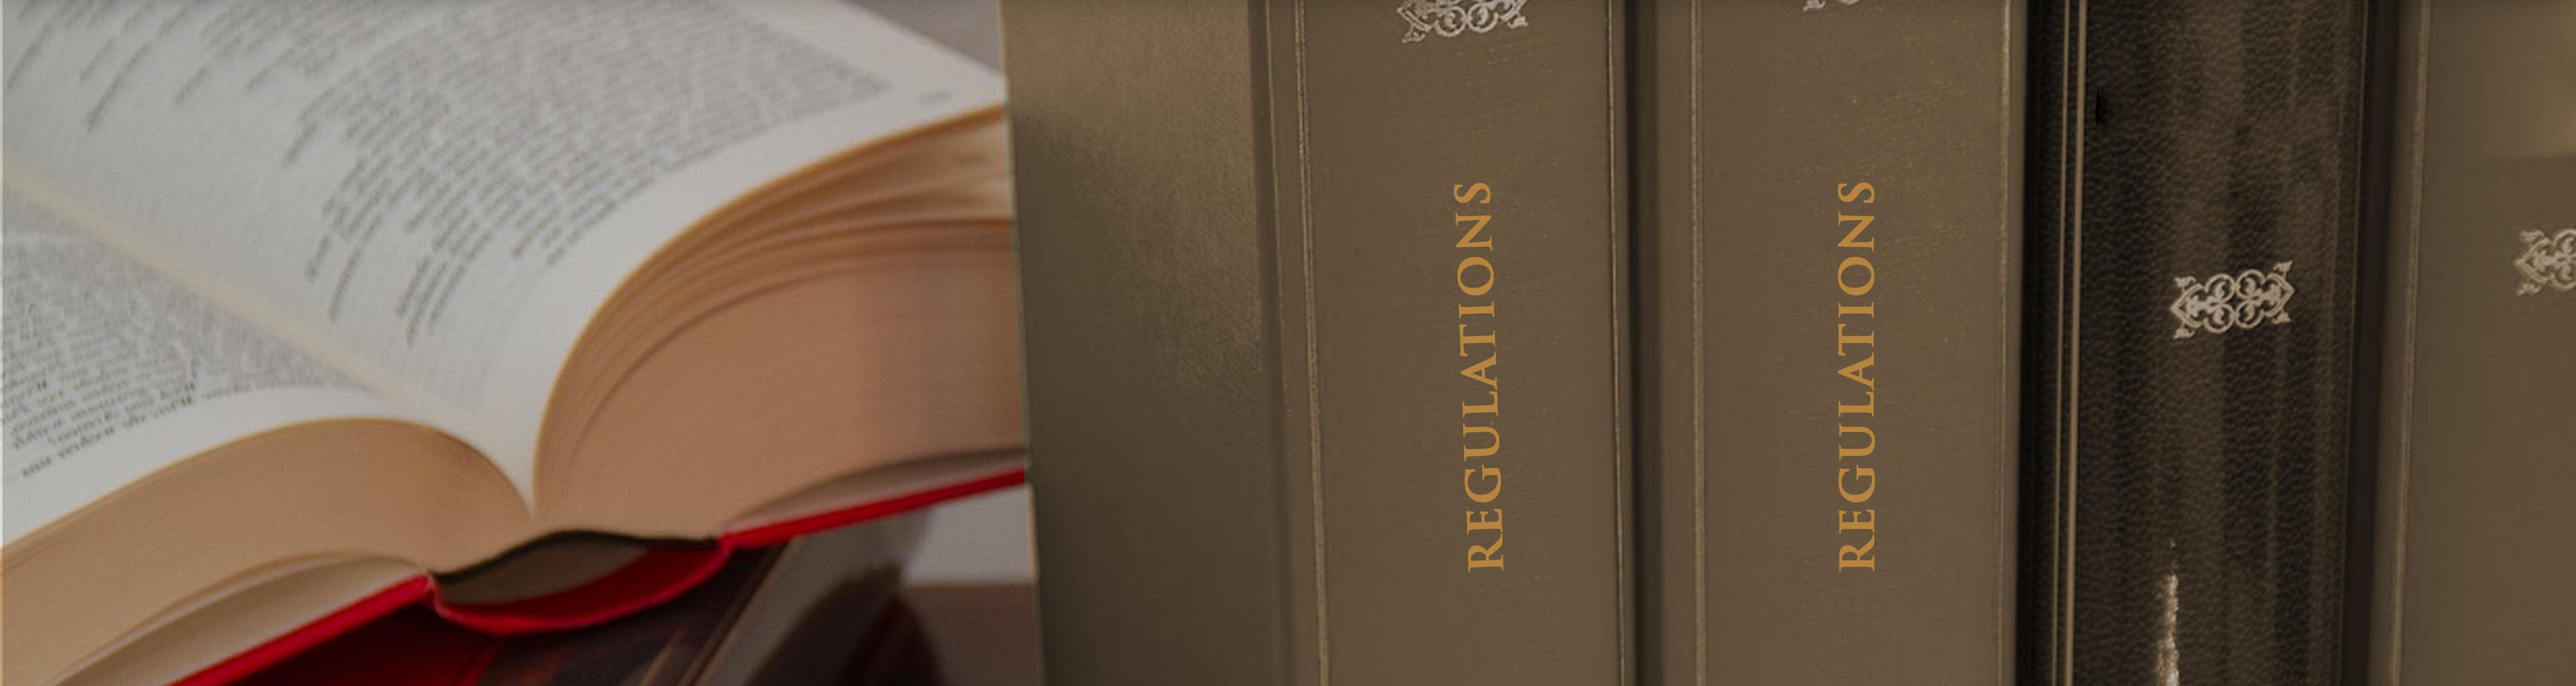 Sansthan Regulations